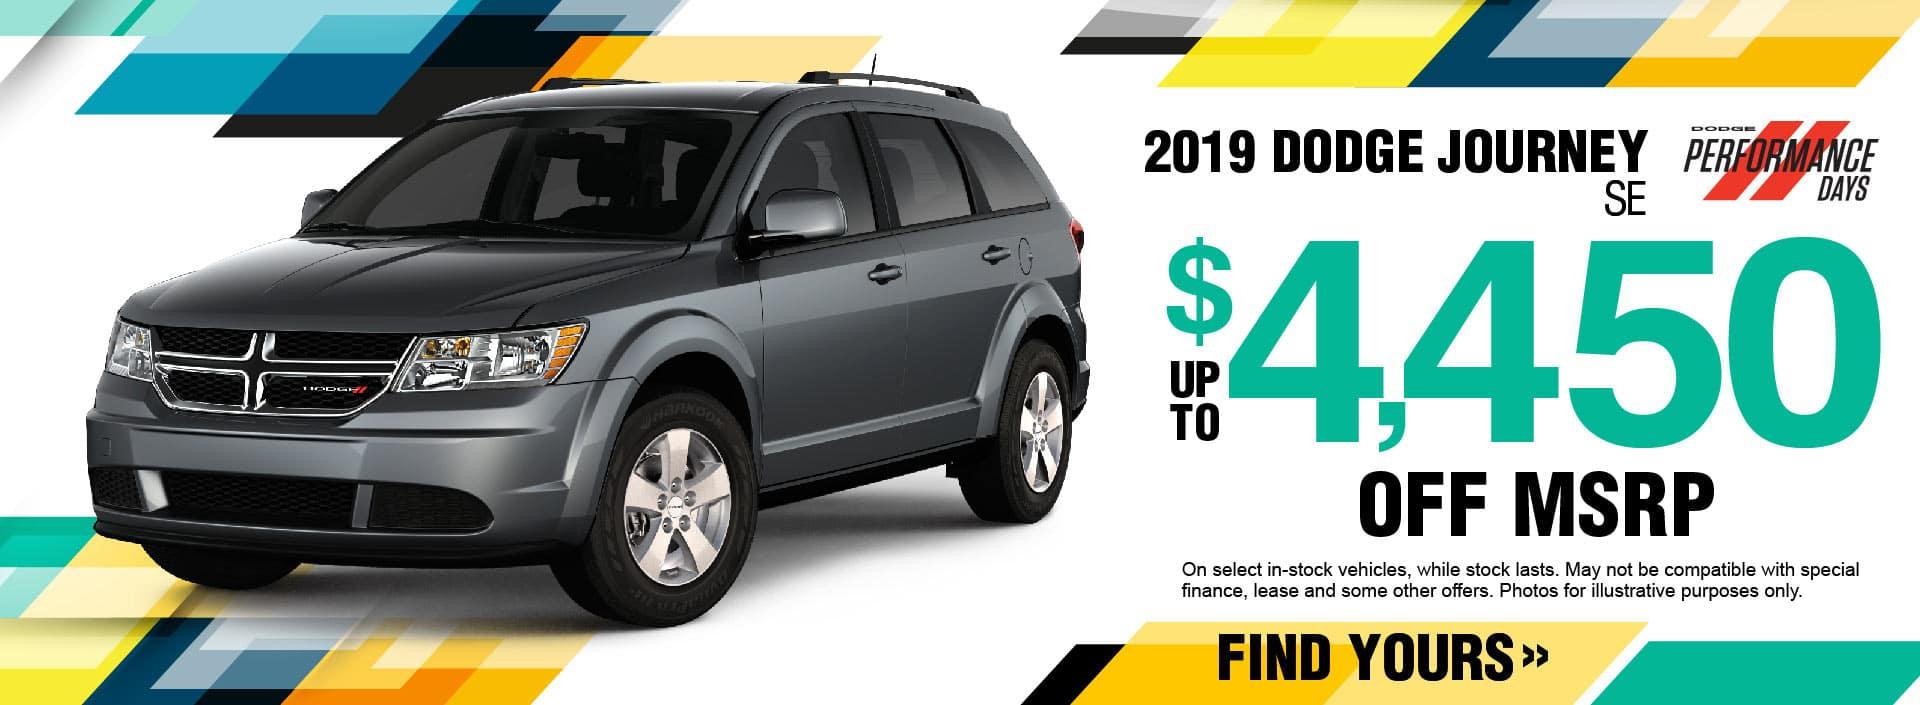 2019 Dodge Journey Savings